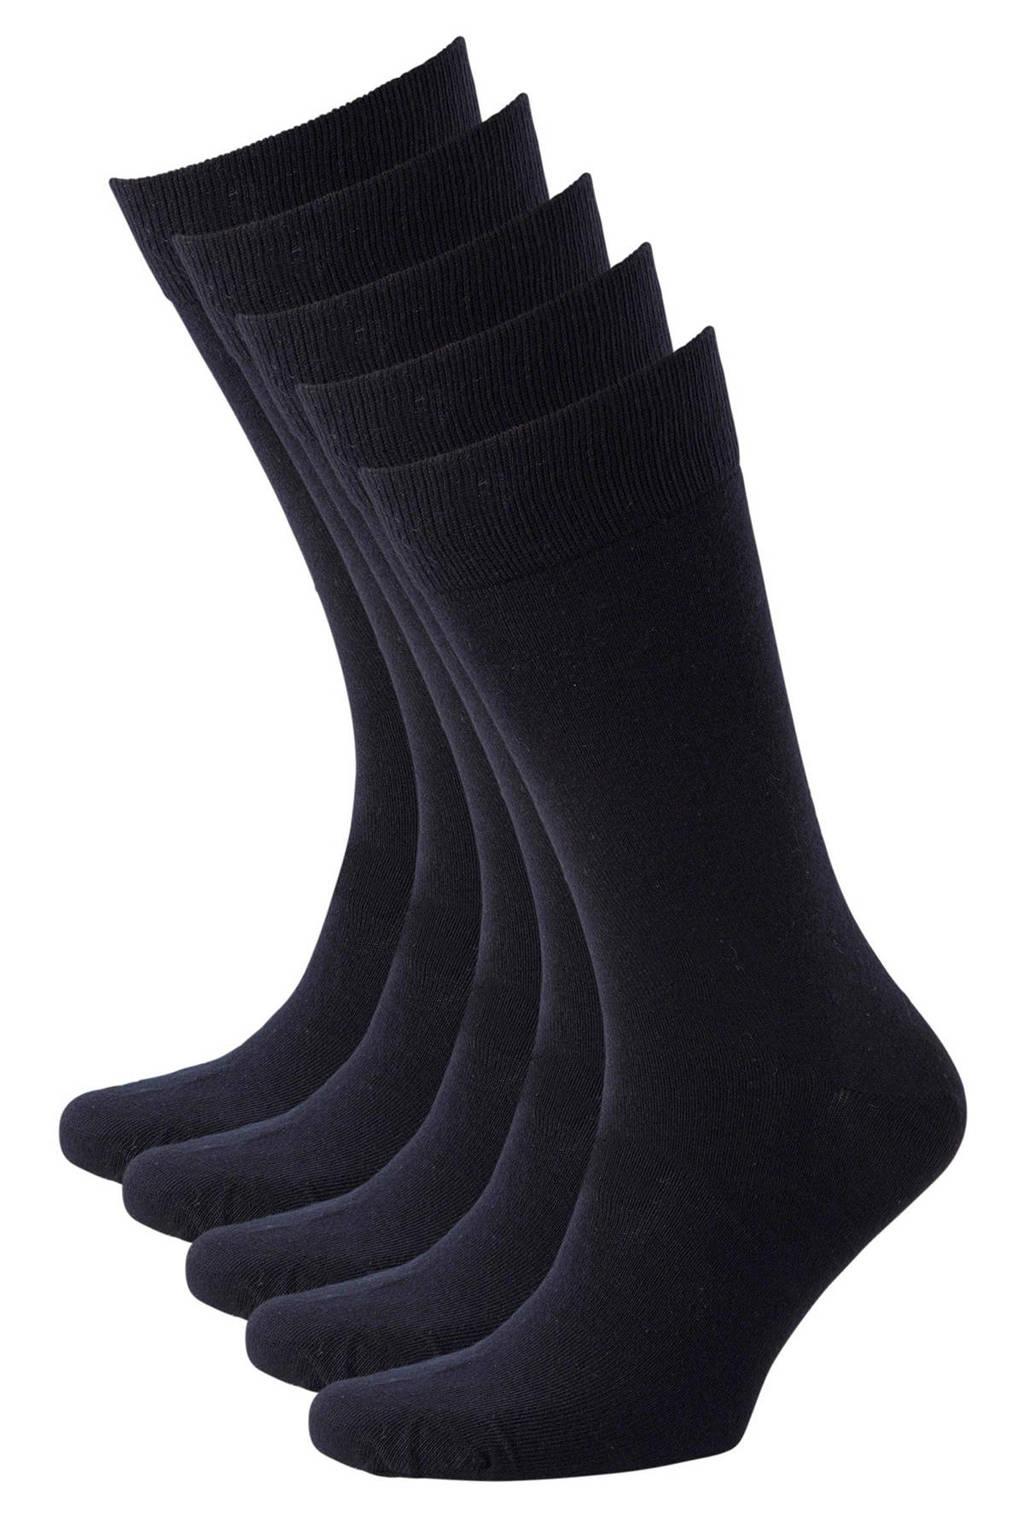 anytime sokken - set van 5 donkerblauw, Donkerblauw